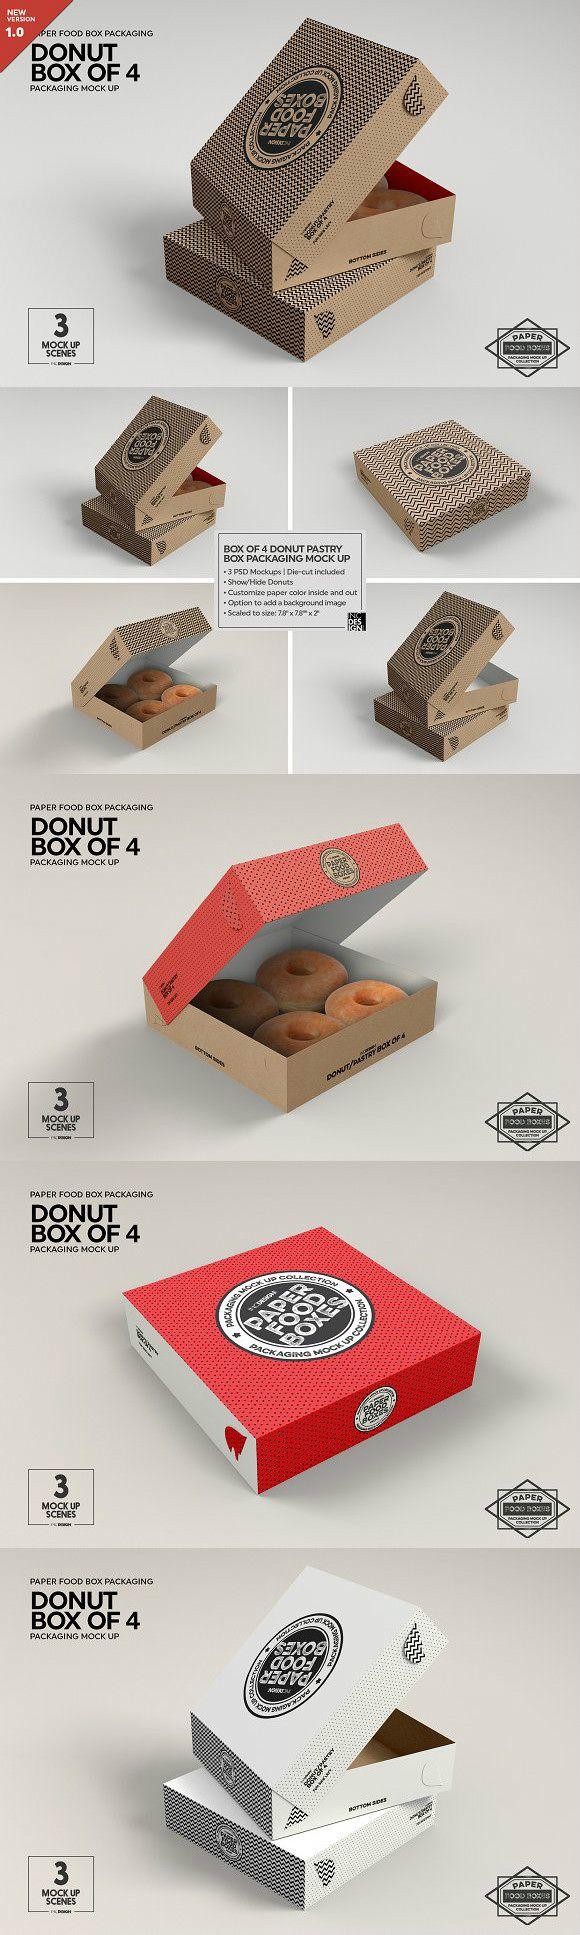 Box of Four Donut Pastry Box Mockup | psd keys | Box mockup